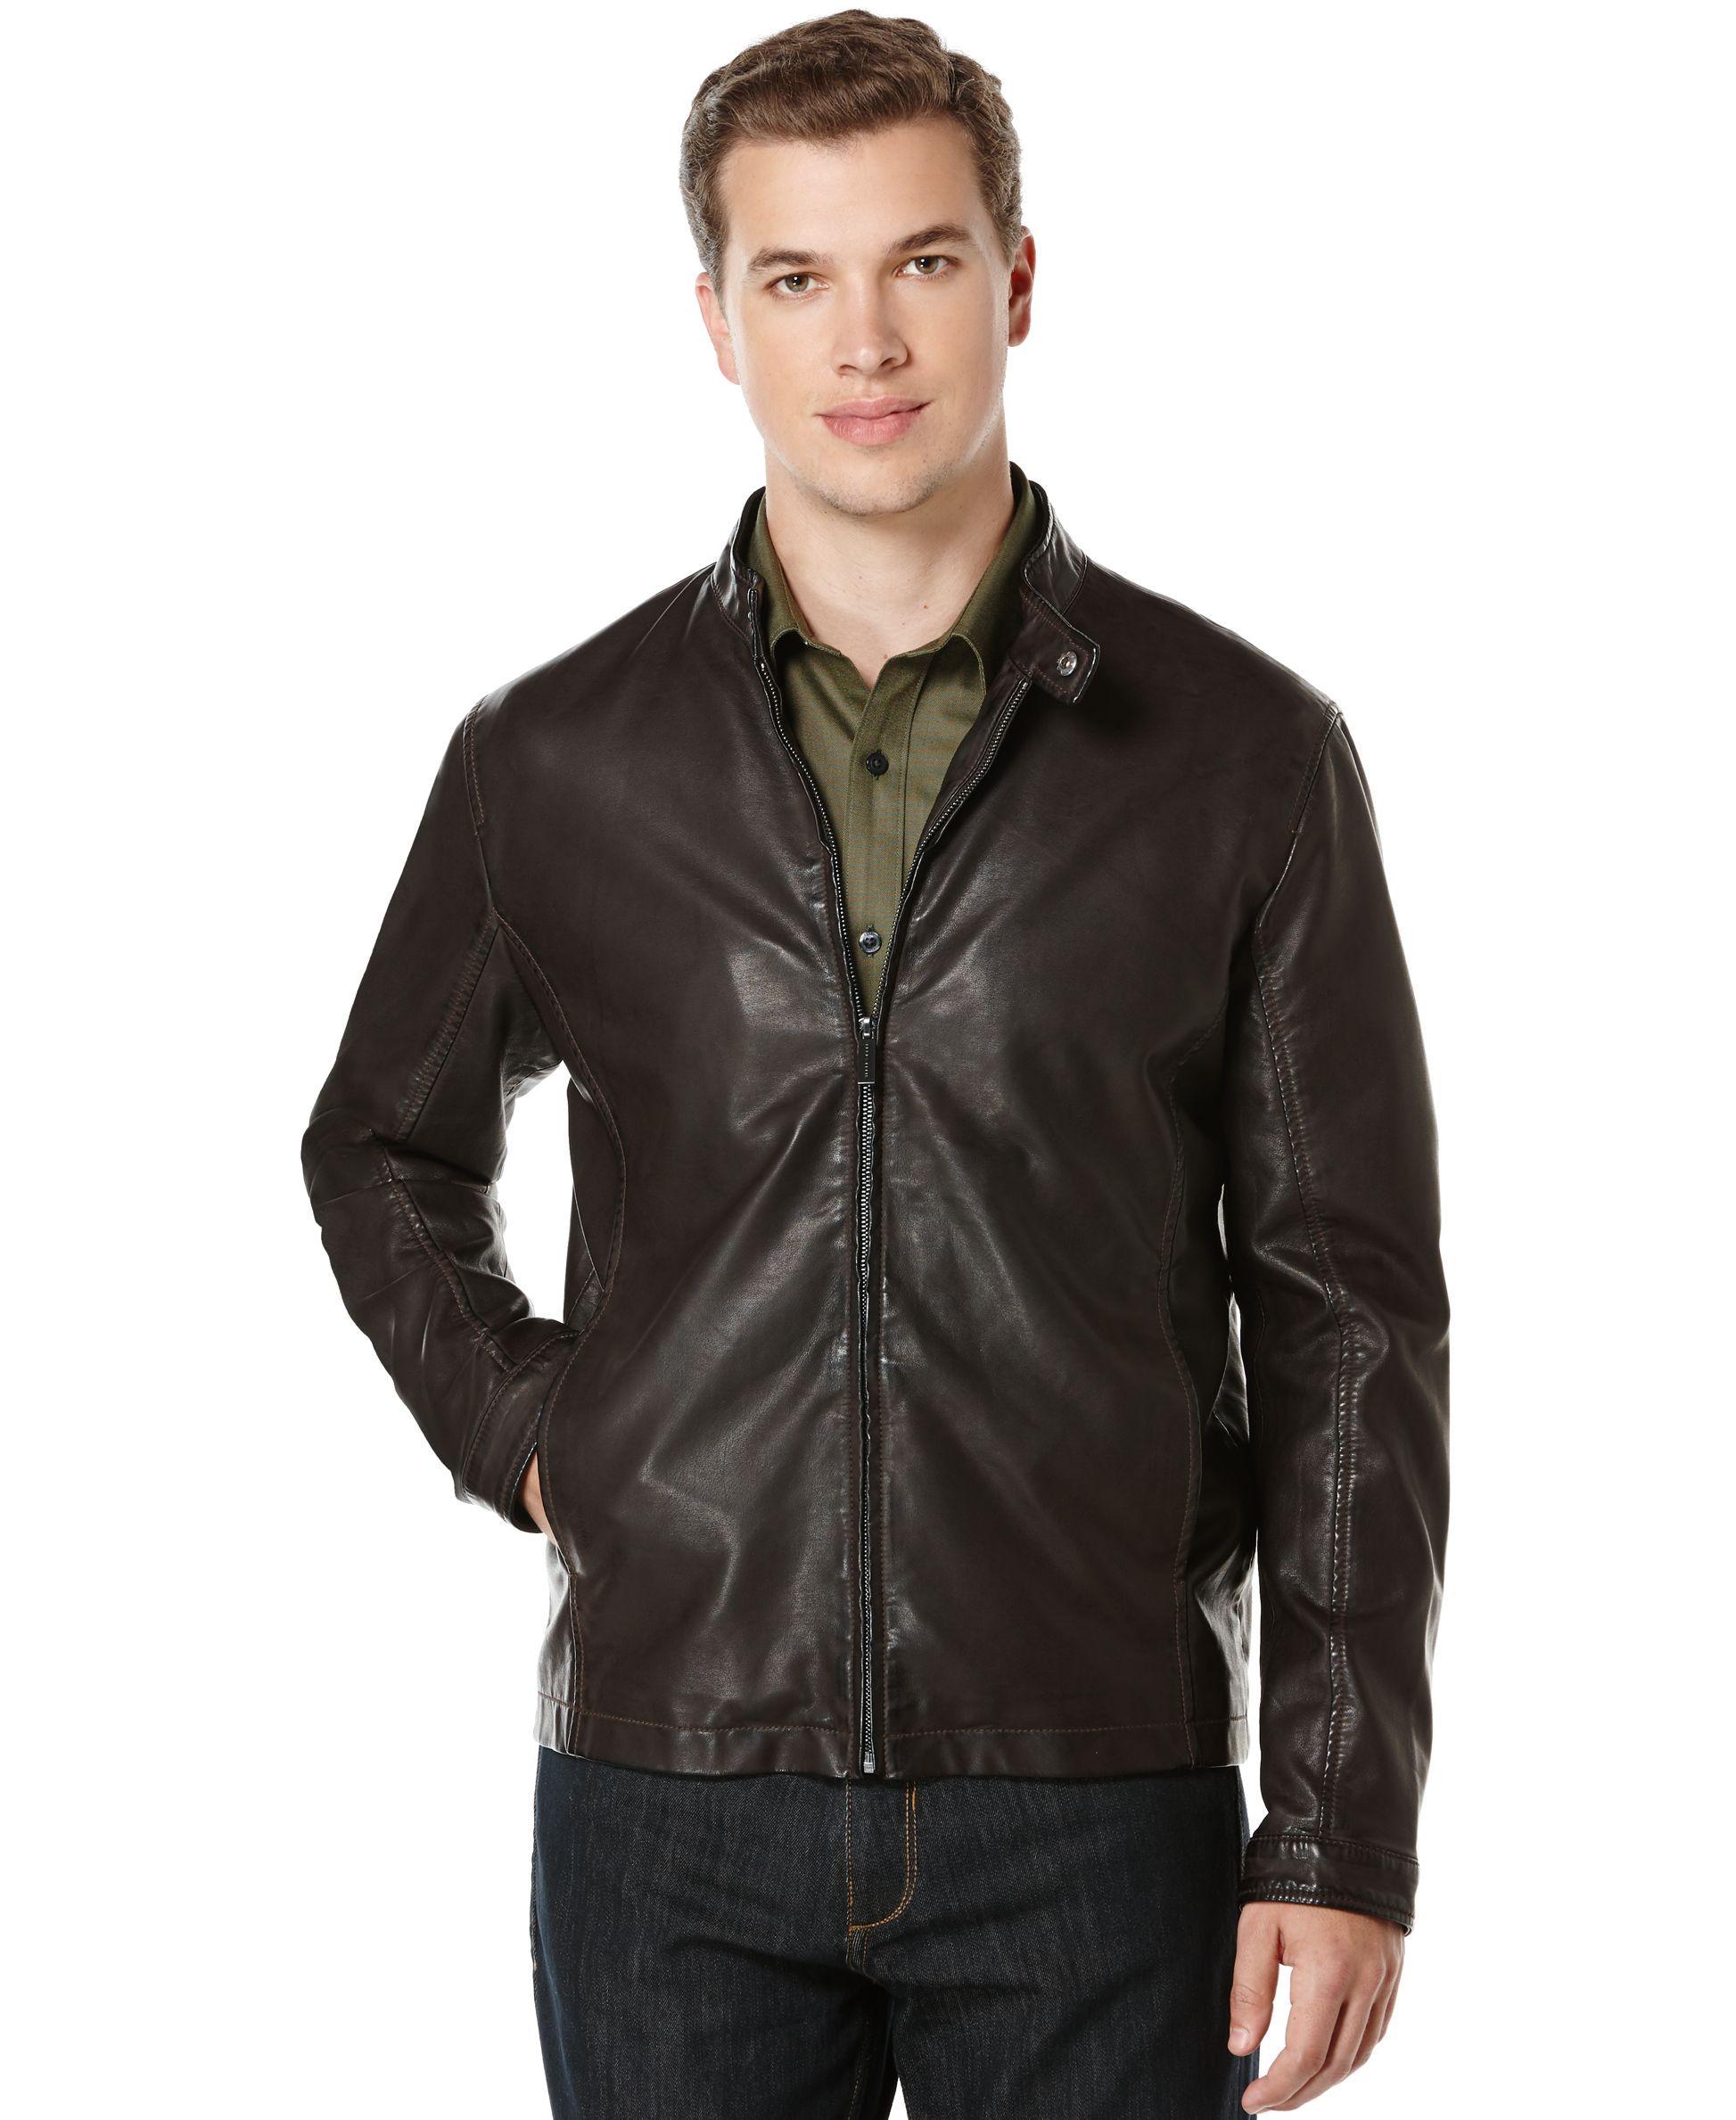 d0de1024e Perry Ellis Faux-Leather Bomber Jacket | Products | Jackets, Leather ...